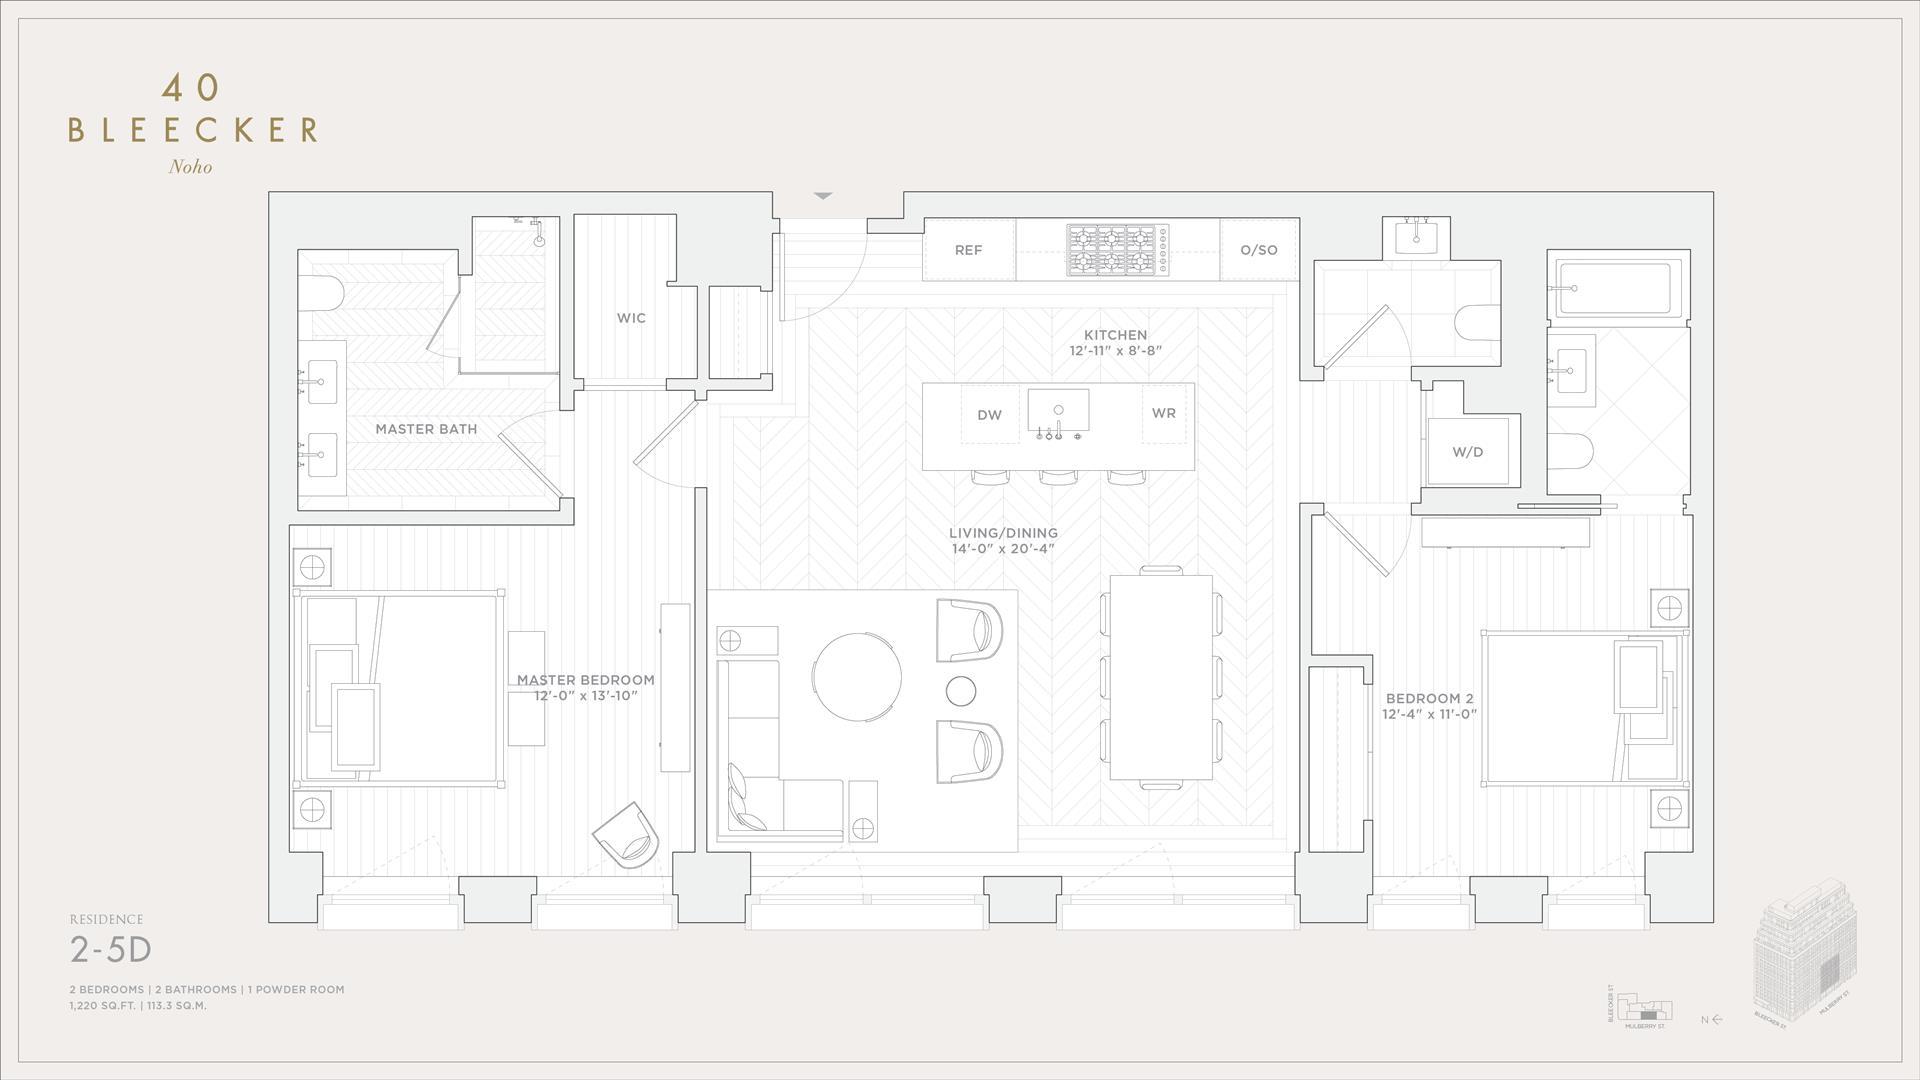 Floor plan of 40 Bleecker Street, 3D - NoHo, New York